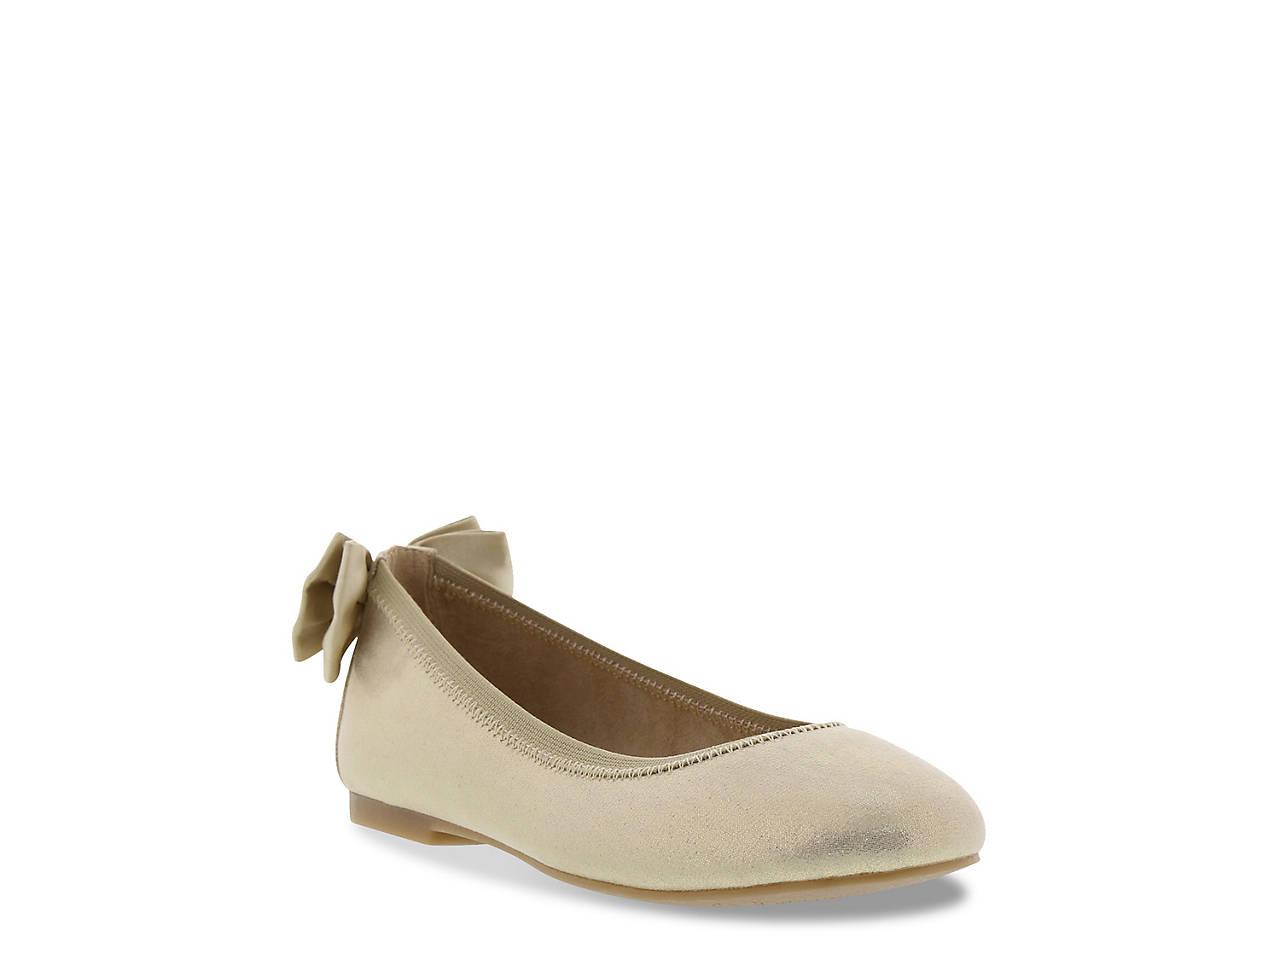 3813de46b252 Sam Edelman Felicia Esmerelda Toddler   Youth Ballet Flat Kids Shoes ...